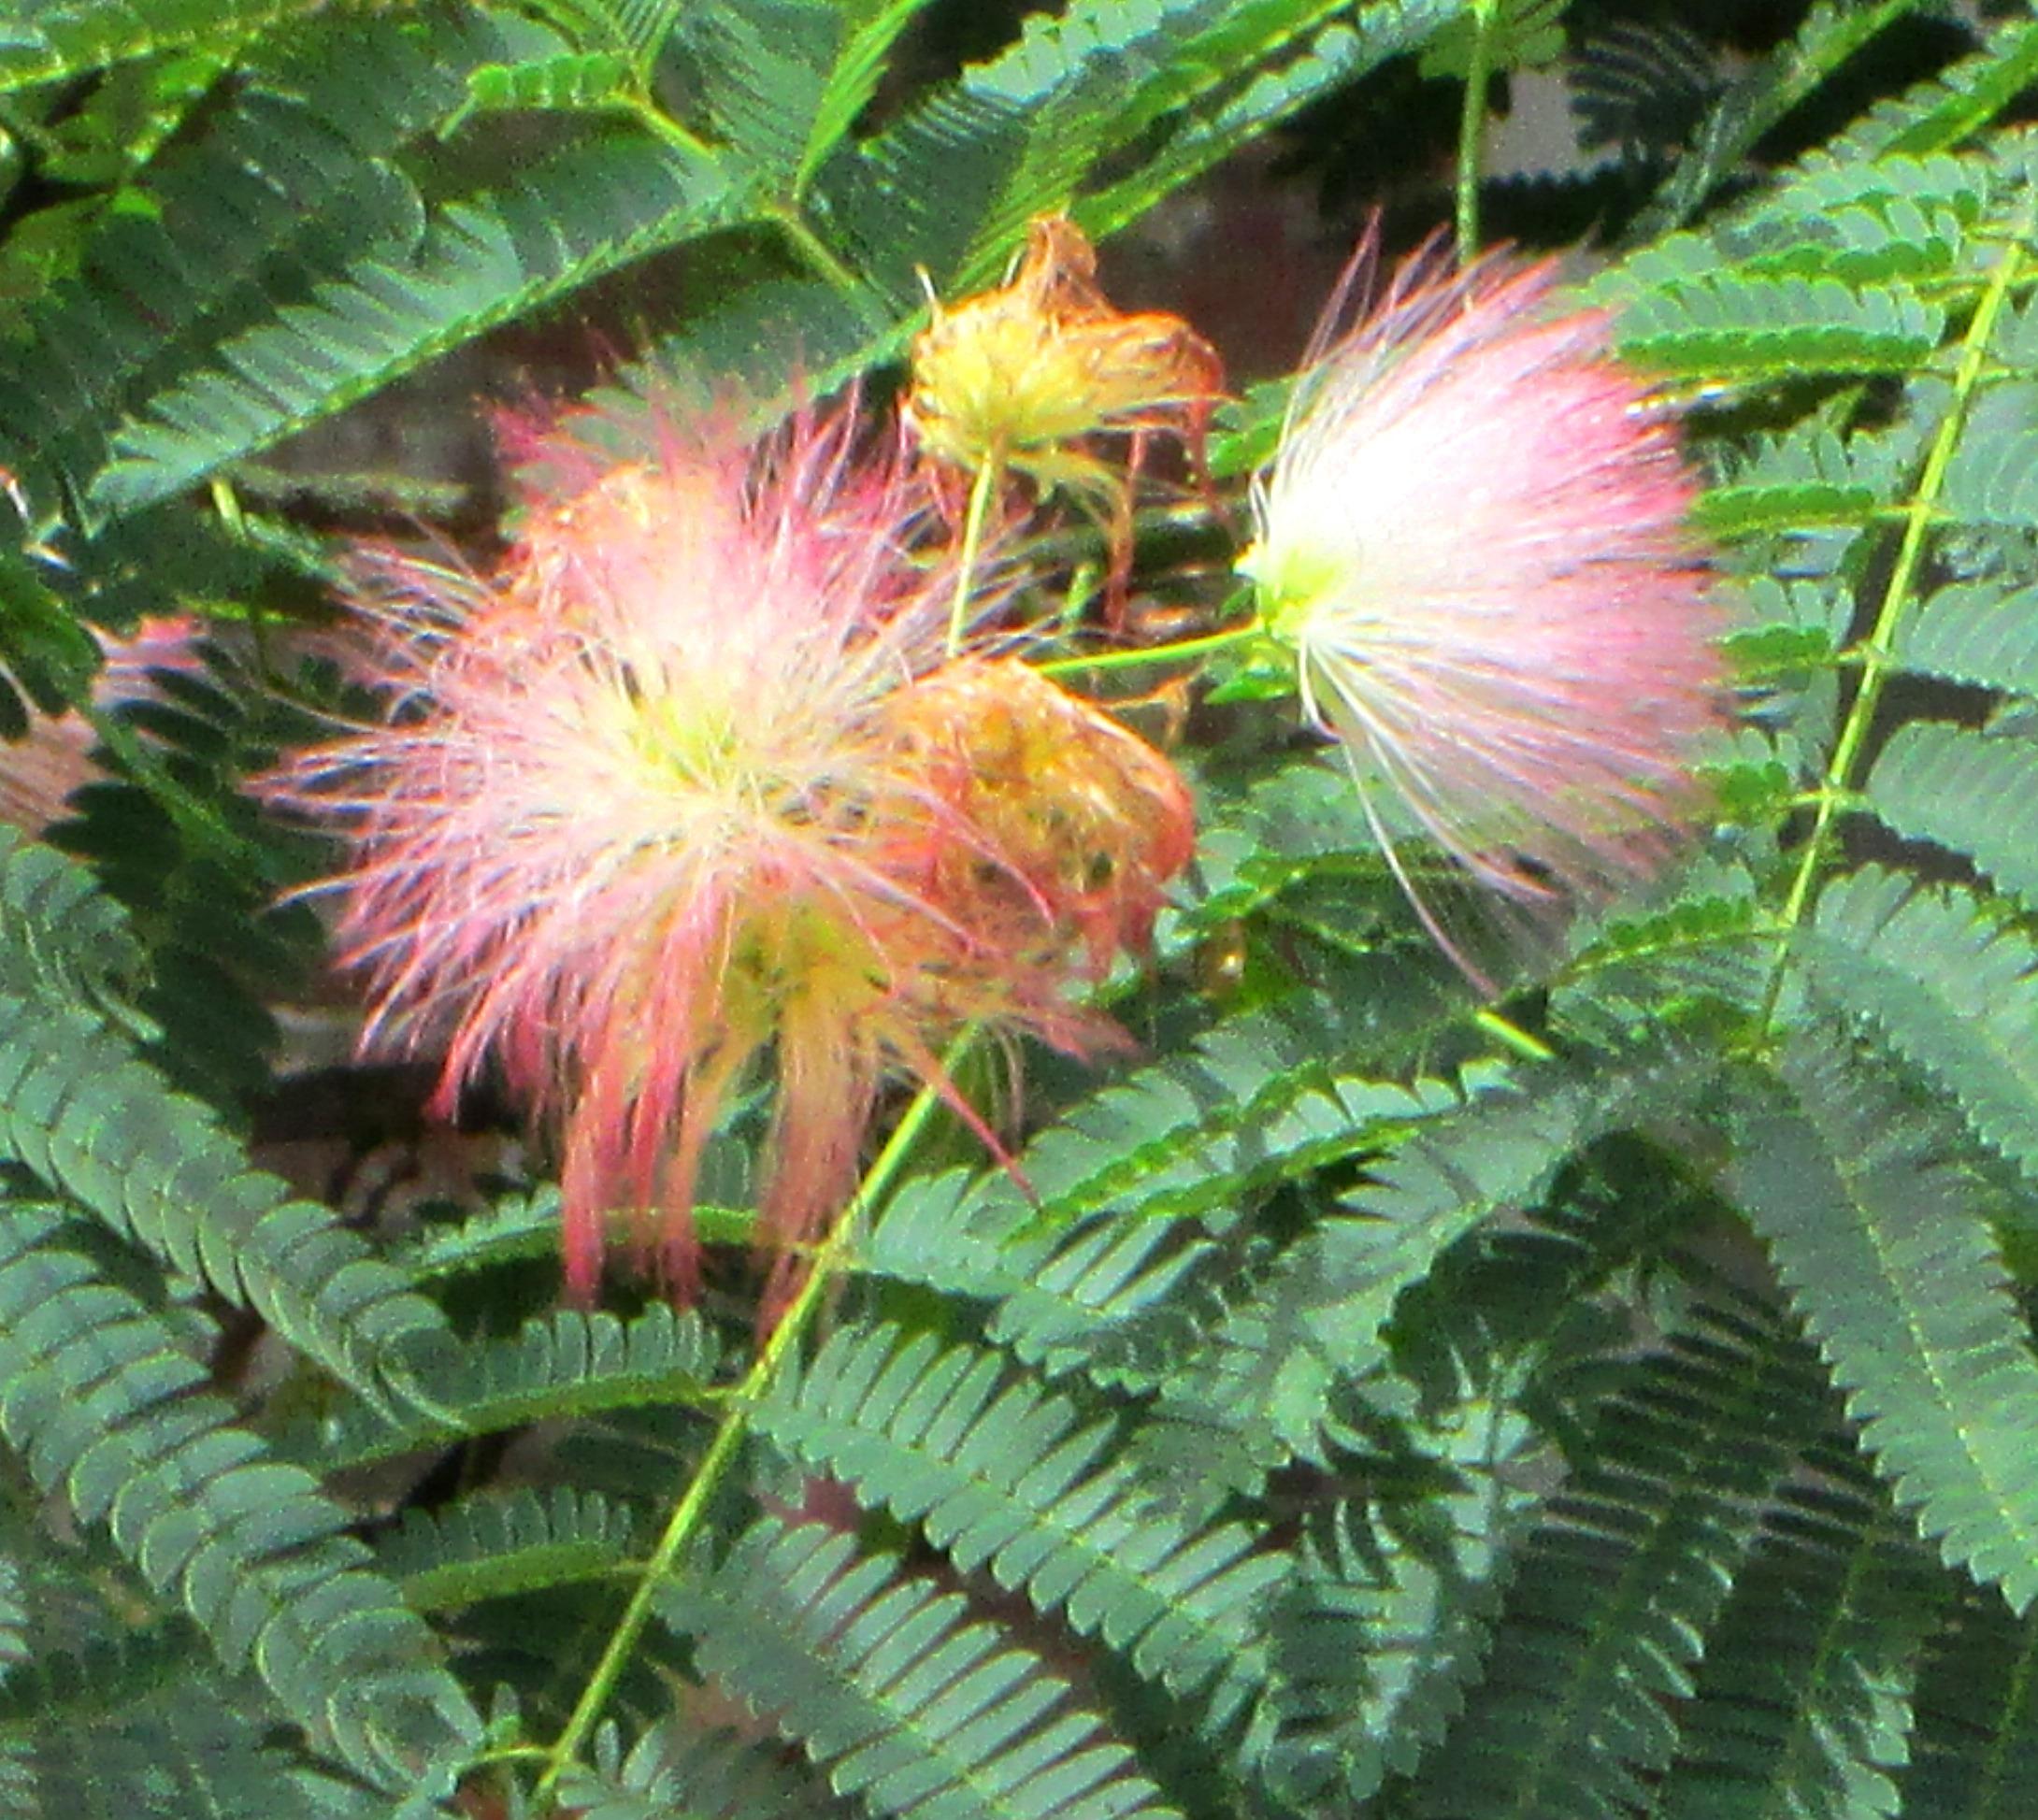 Filepersian silk tree nyc flowers closeup 2g wikimedia commons filepersian silk tree nyc flowers closeup 2g mightylinksfo